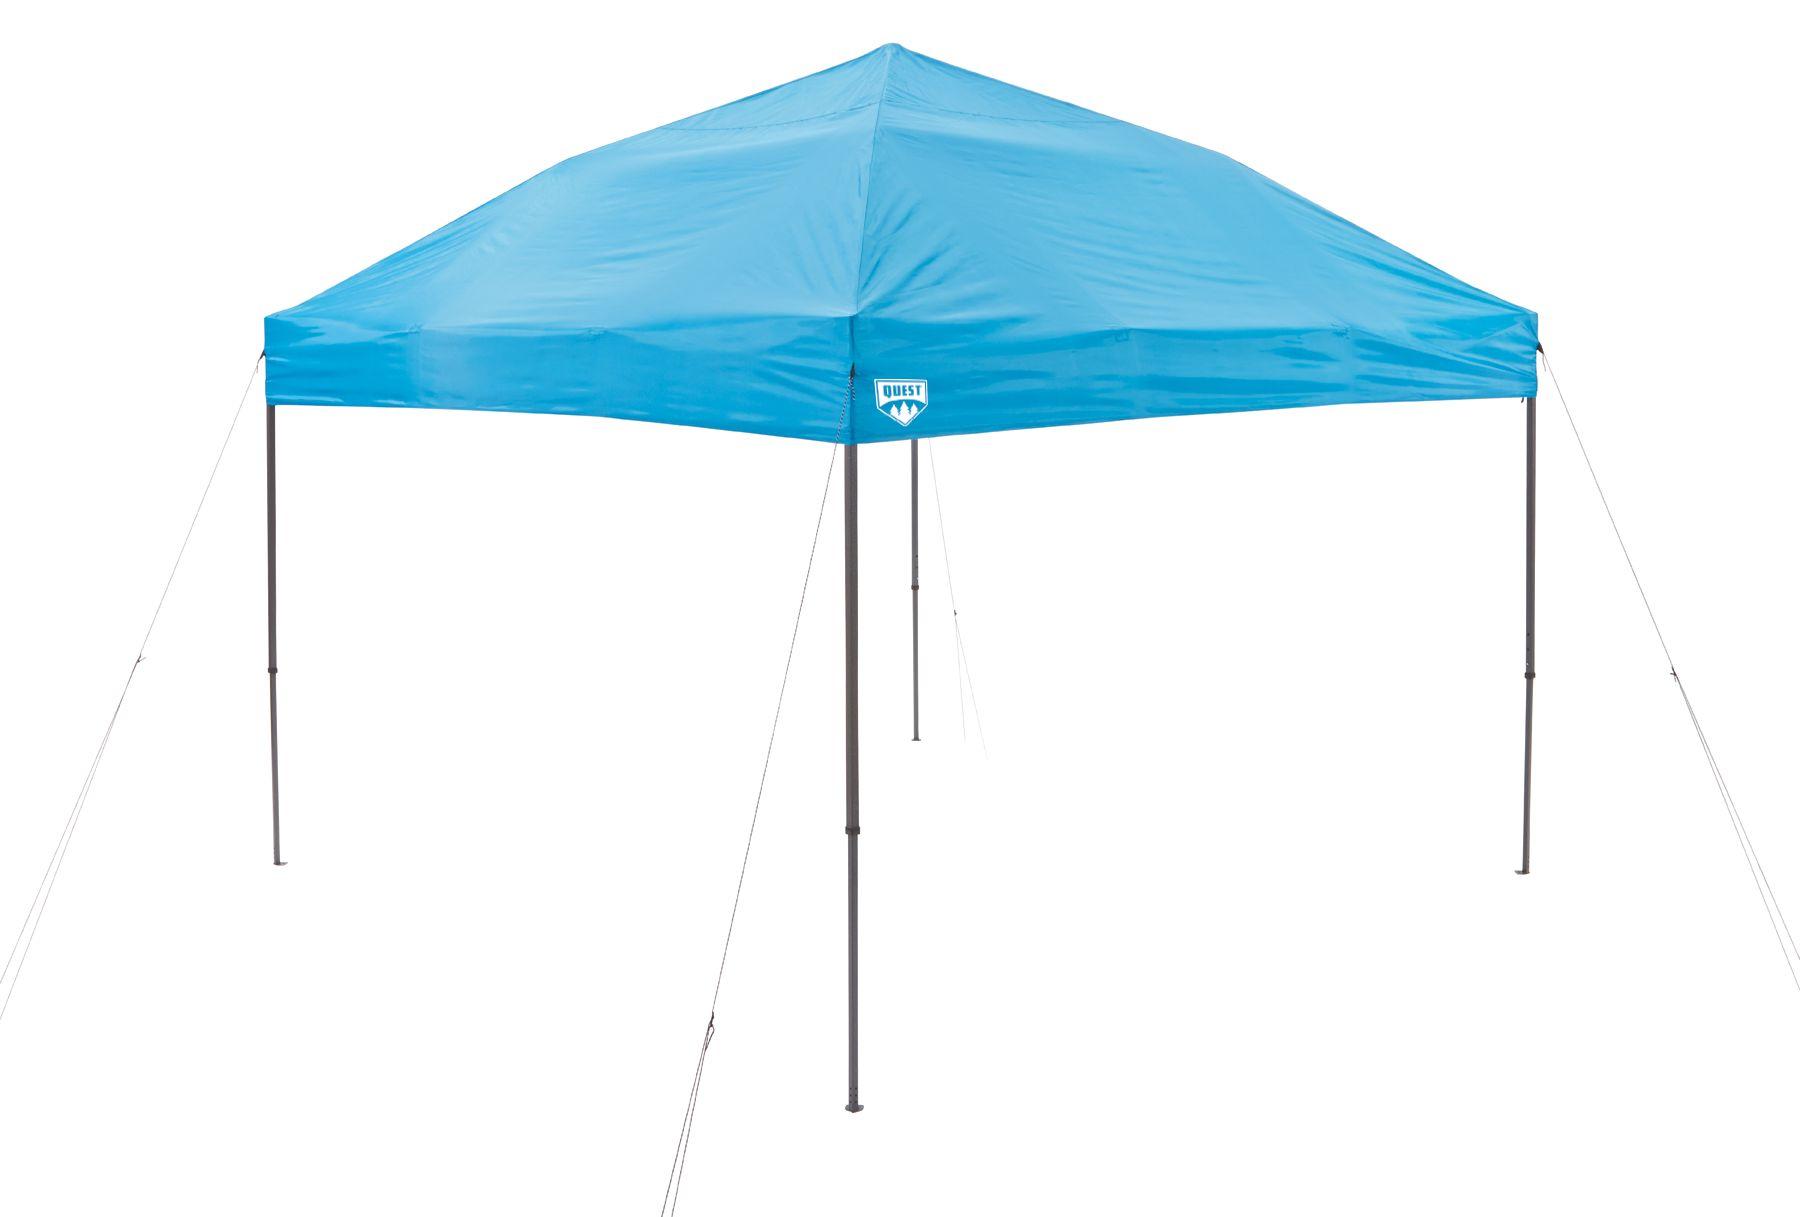 product image quest 12u0027 x 12u0027 straight leg canopy - 10x20 Pop Up Canopy